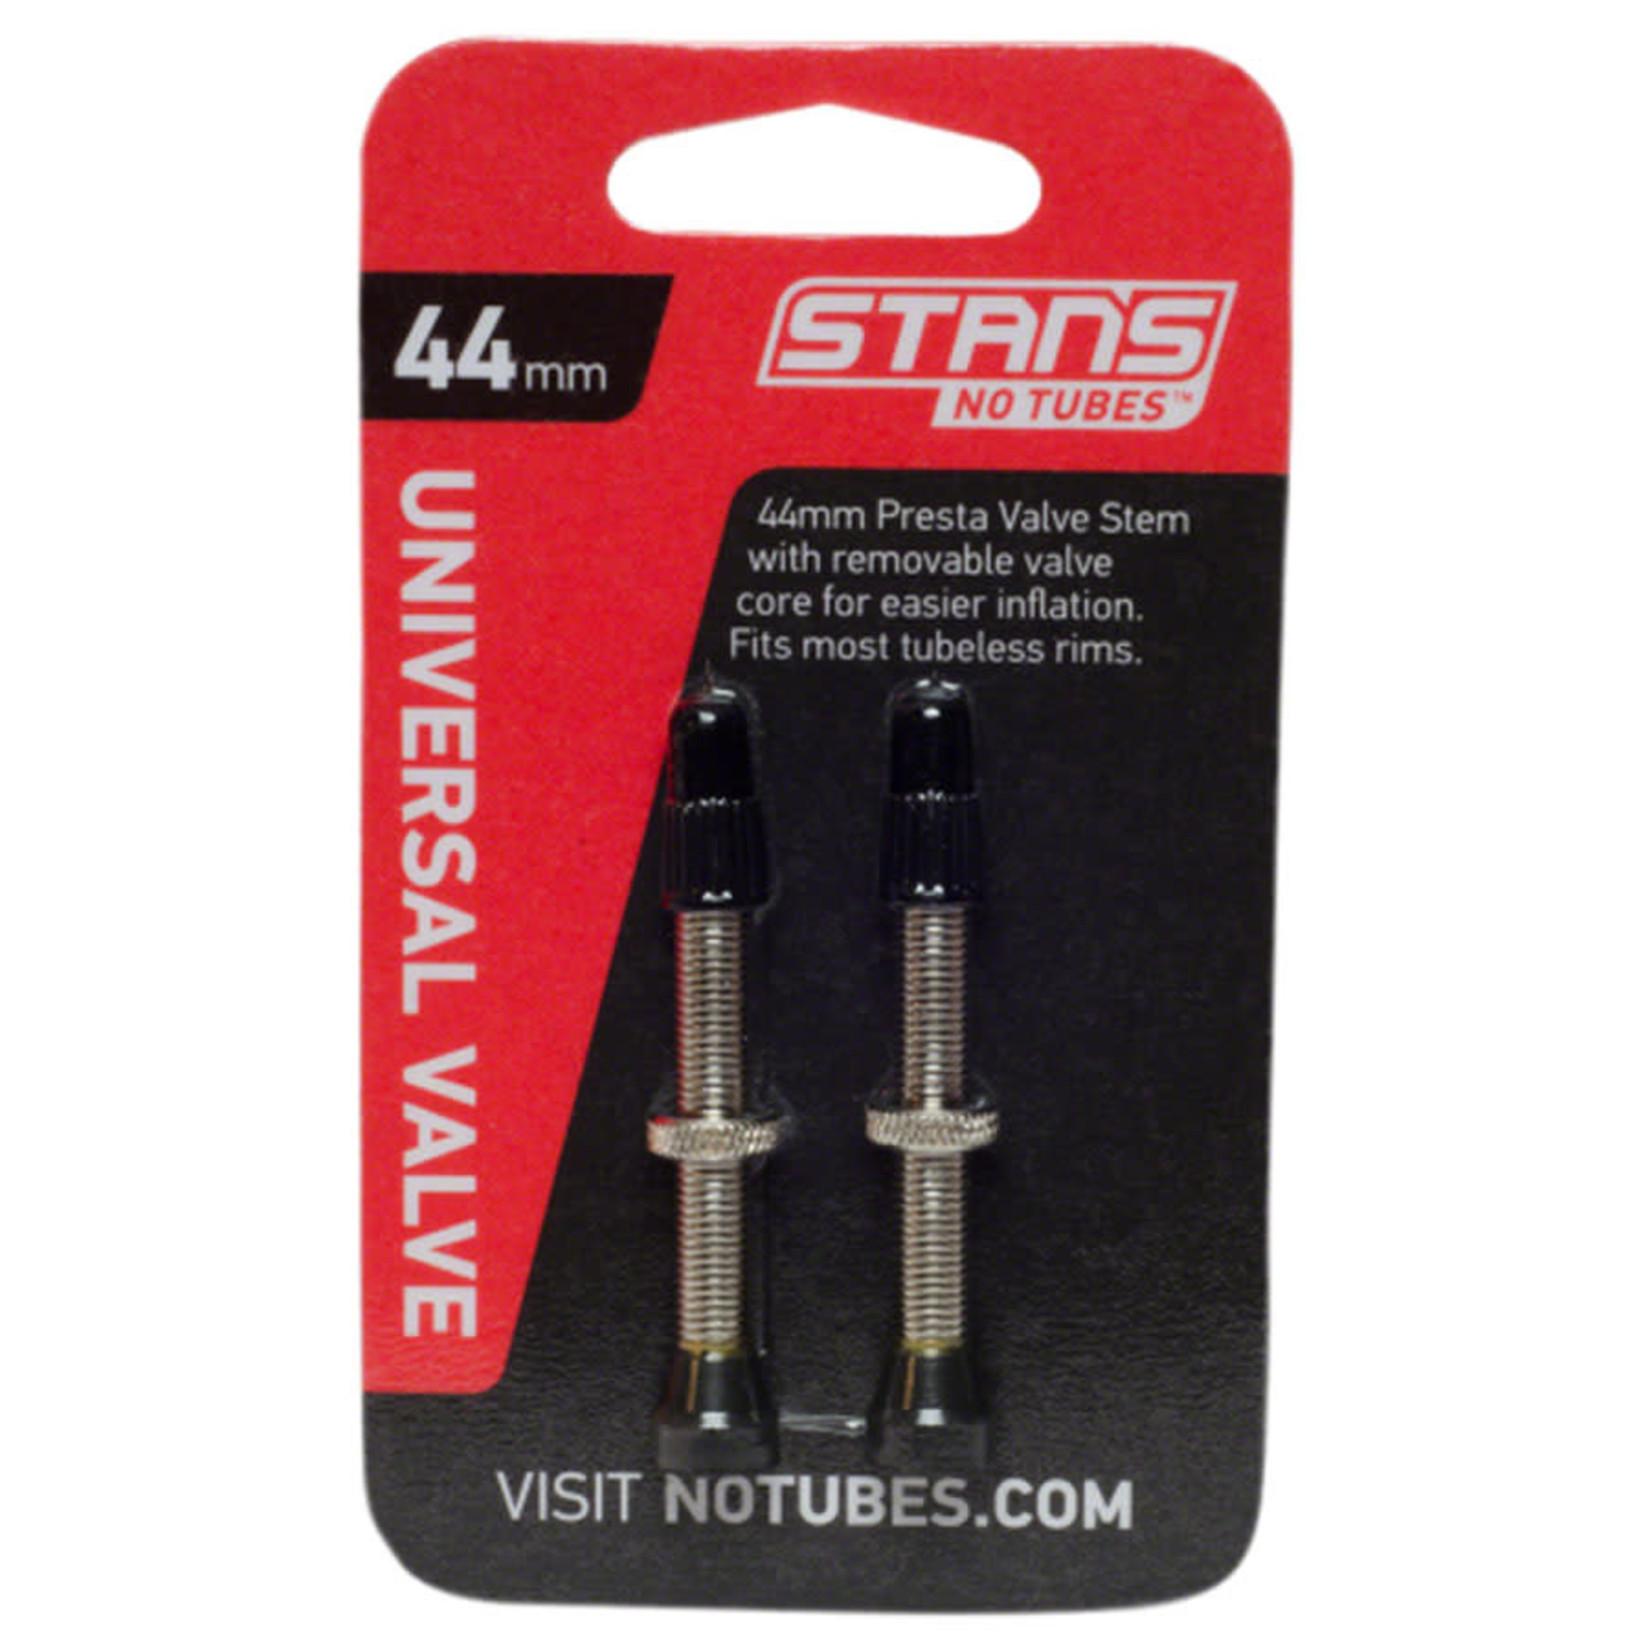 Stan's No Tubes Stan's NoTubes Brass Valve Stems - 44mm, Pair